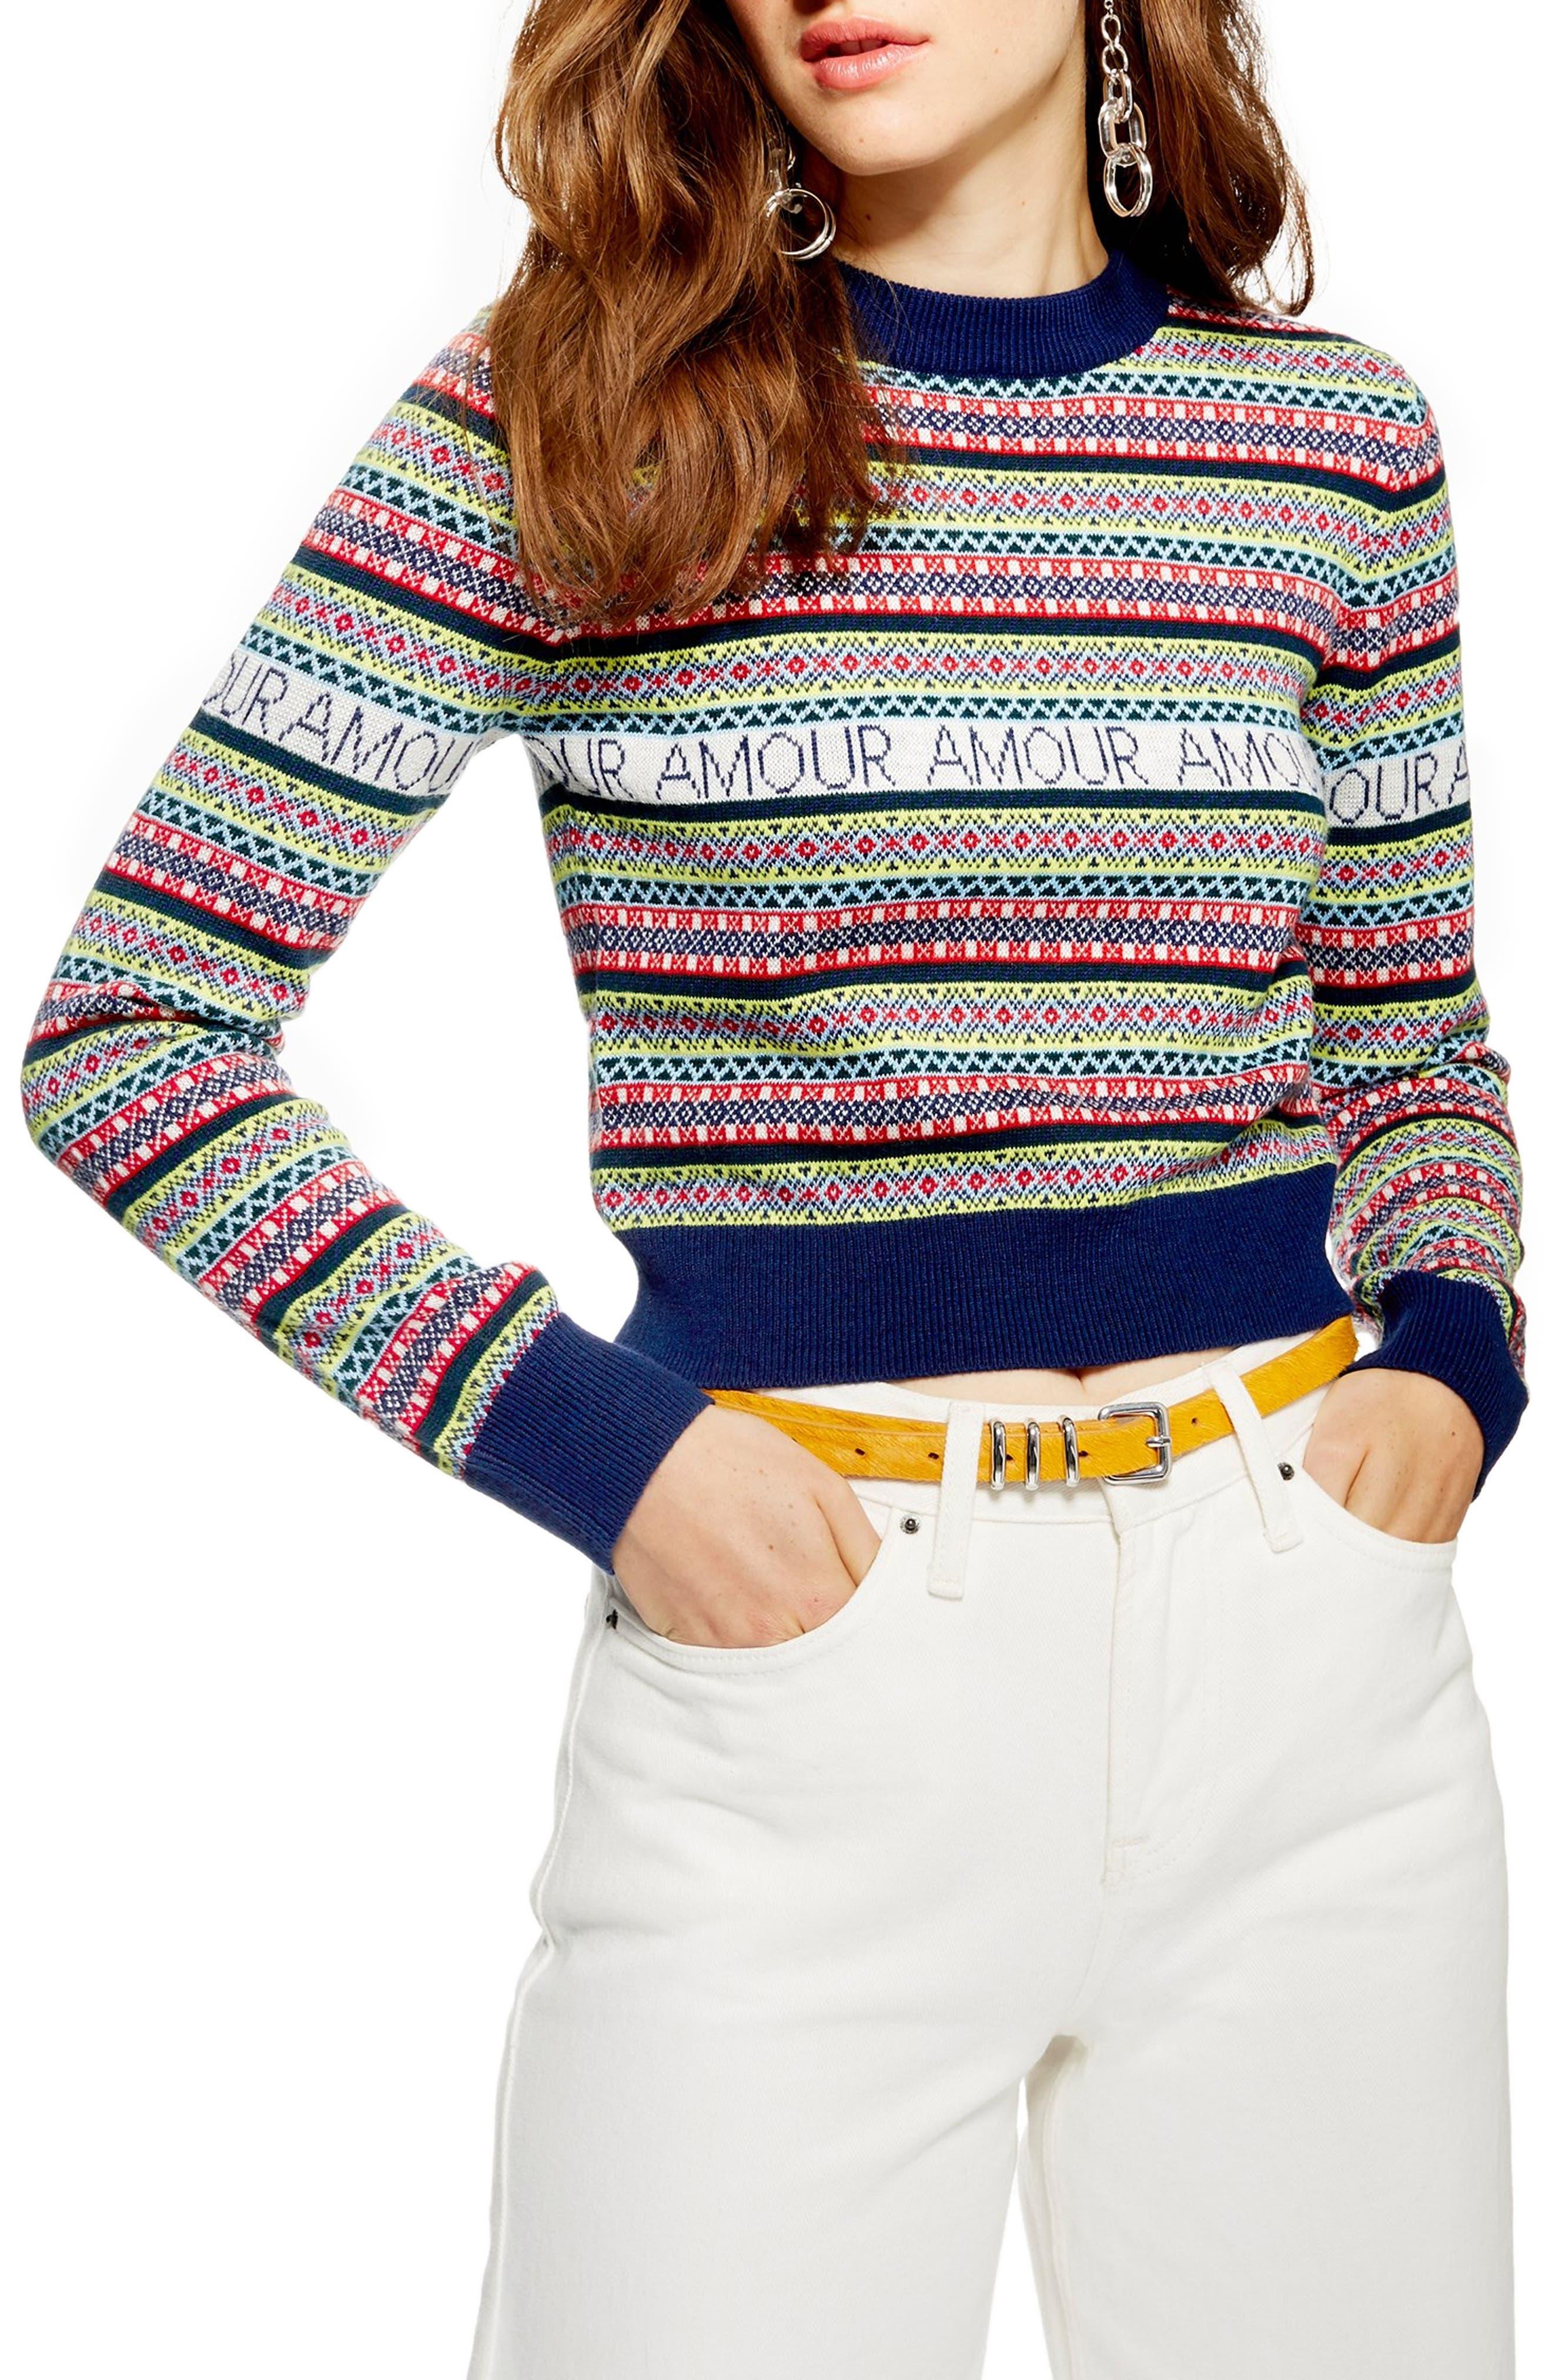 Amour Fair Isle Sweater,                         Main,                         color, NAVY BLUE MULTI